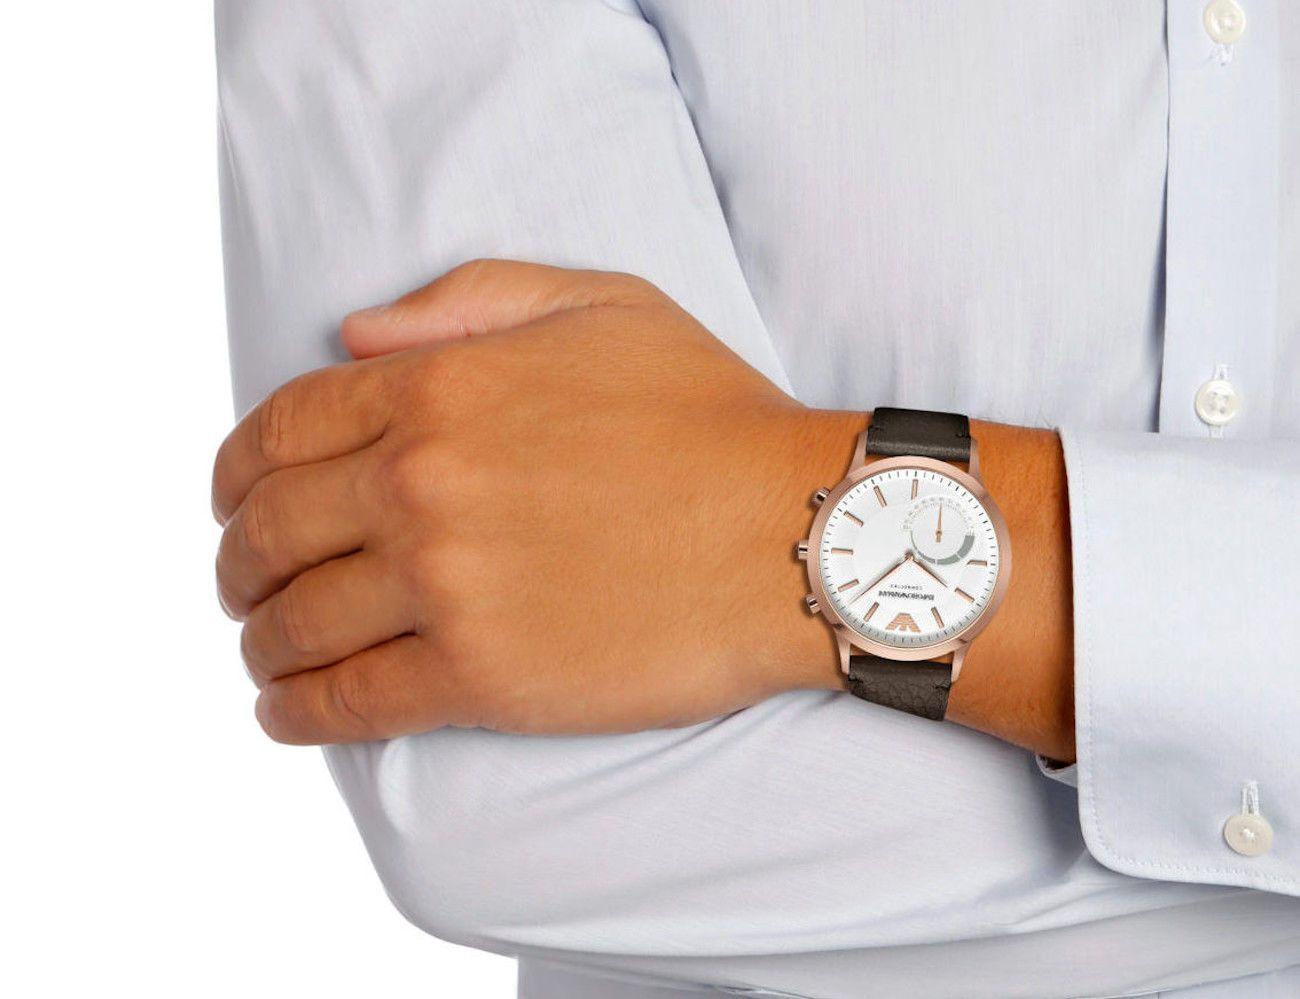 Armani EA Connected Hybrid Smartwatch